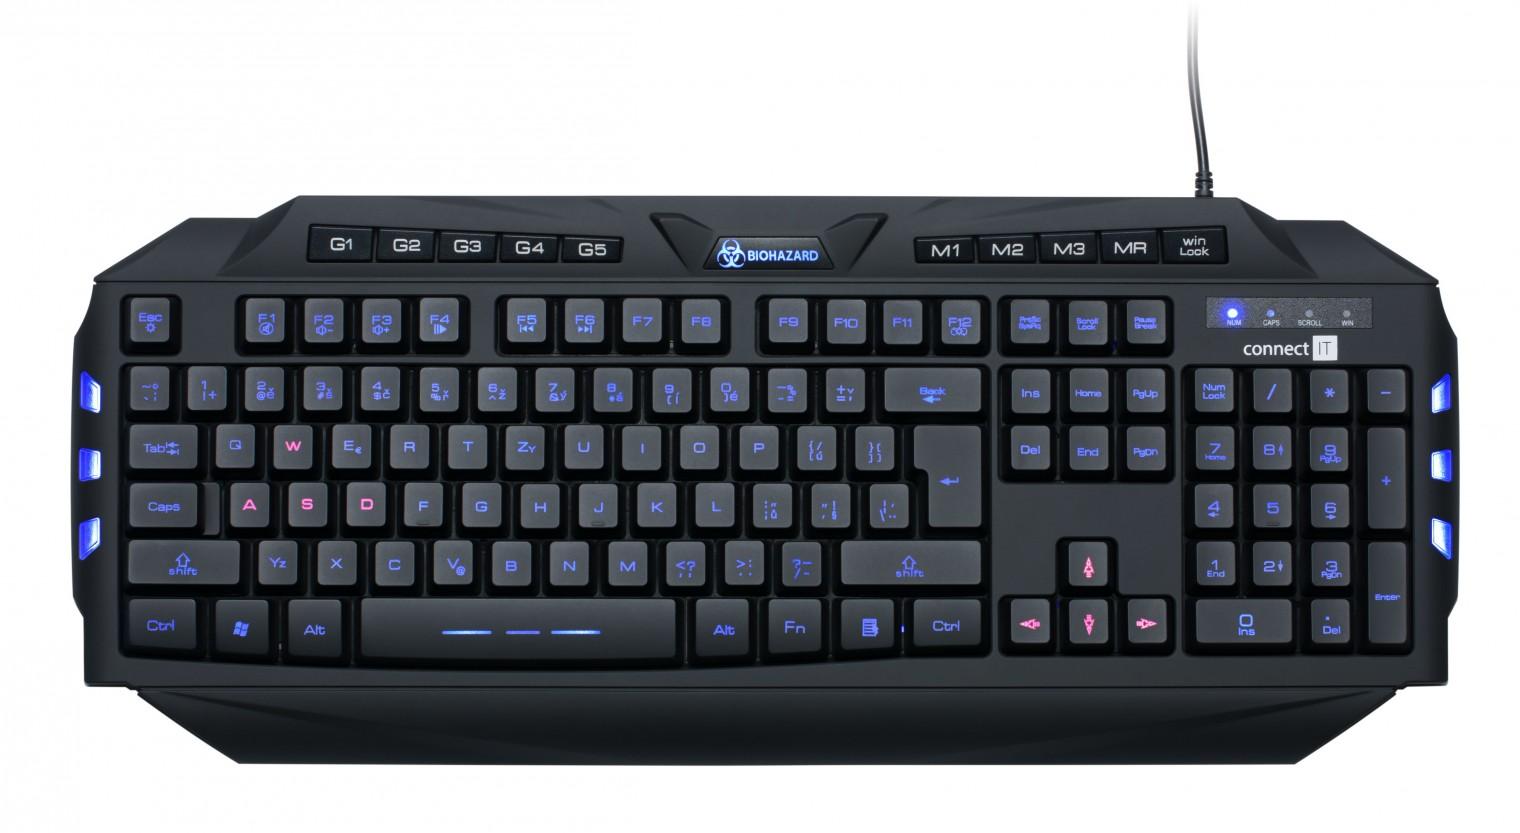 Herné klávesnice Connect IT CI-218 Biohazard Keyboard GK2000 USB CZ, čierna BAZAR